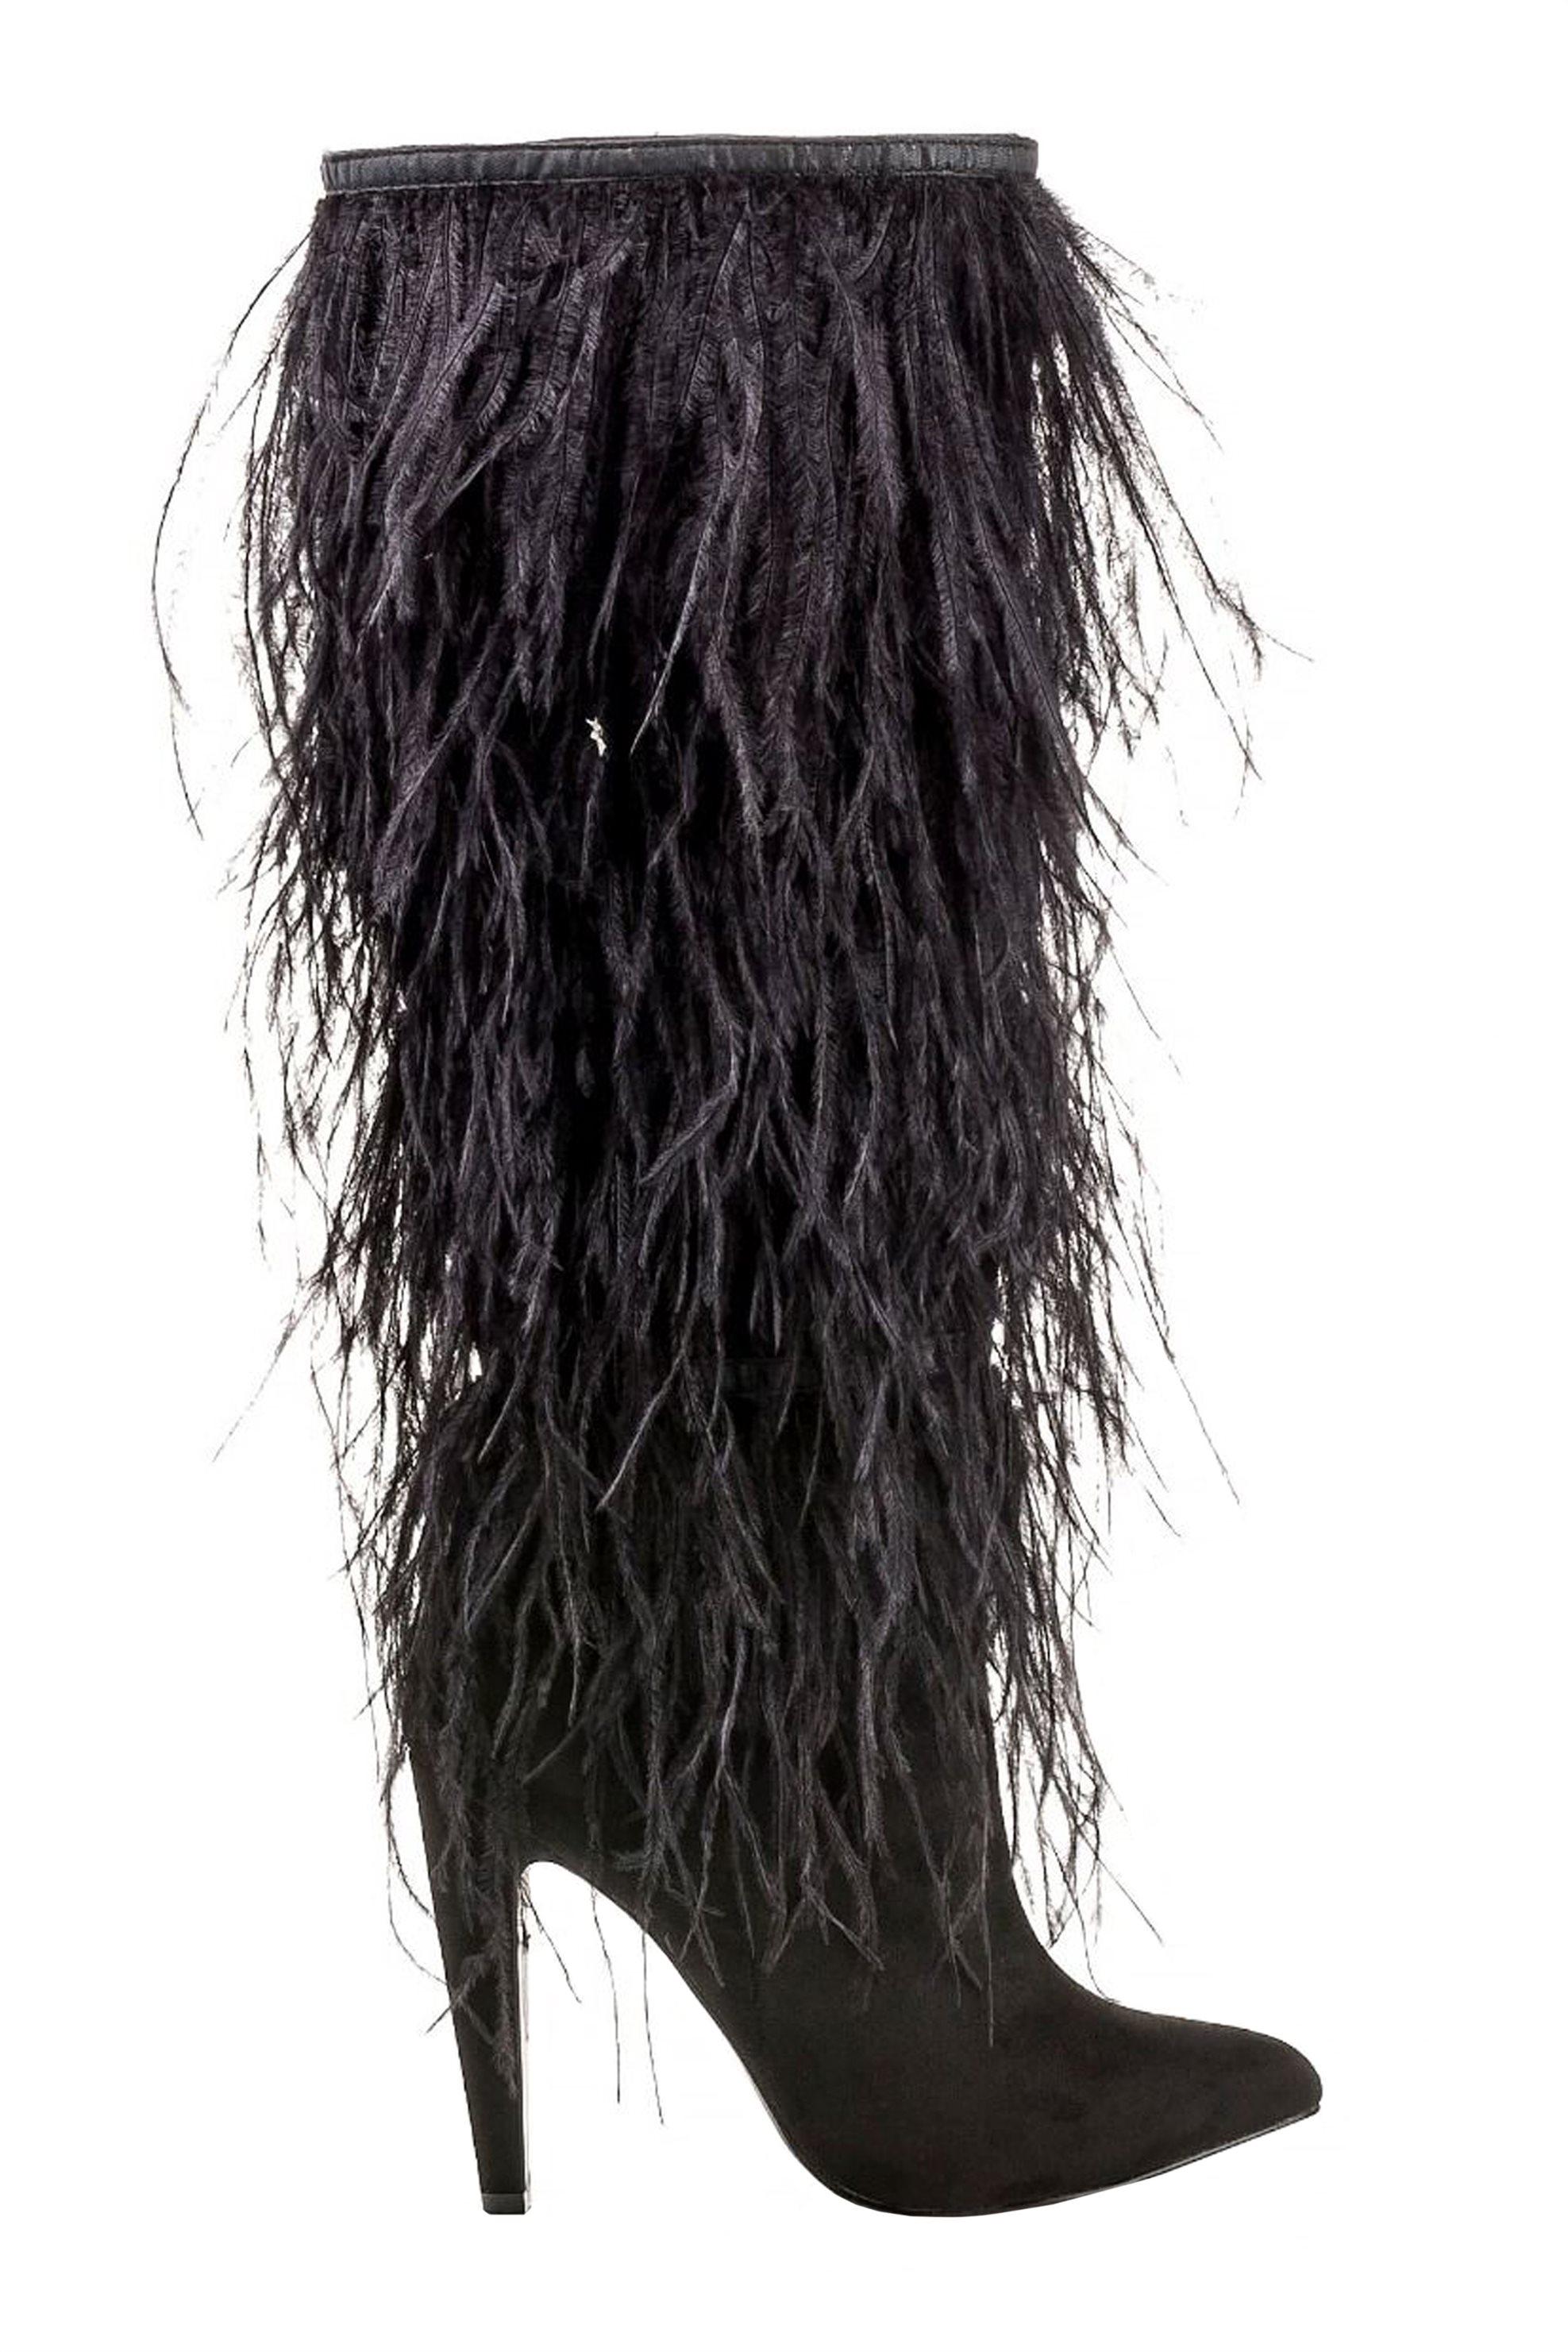 Steve Madden γυναικεία μποτά με φτερά – 218744-ALESANDRA – Μαύρο